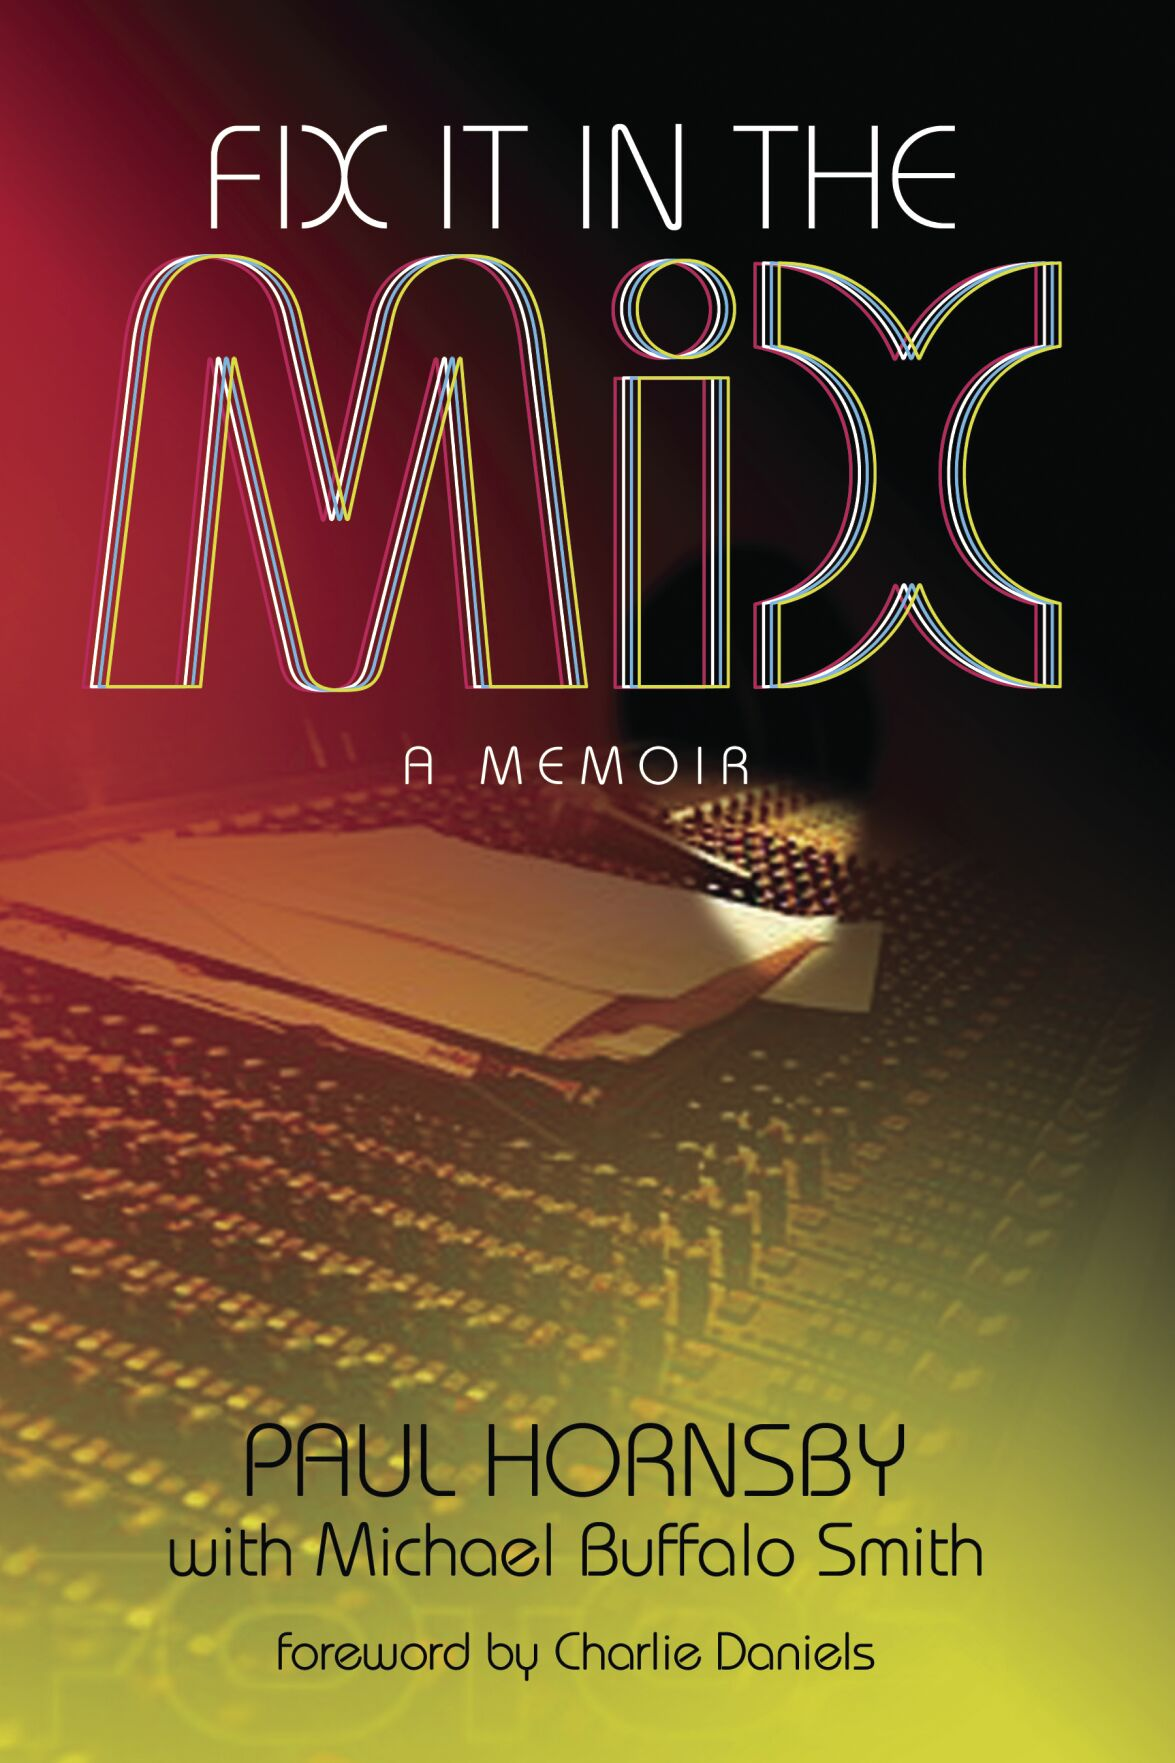 Paul Hornsby tells the music career in memoirs